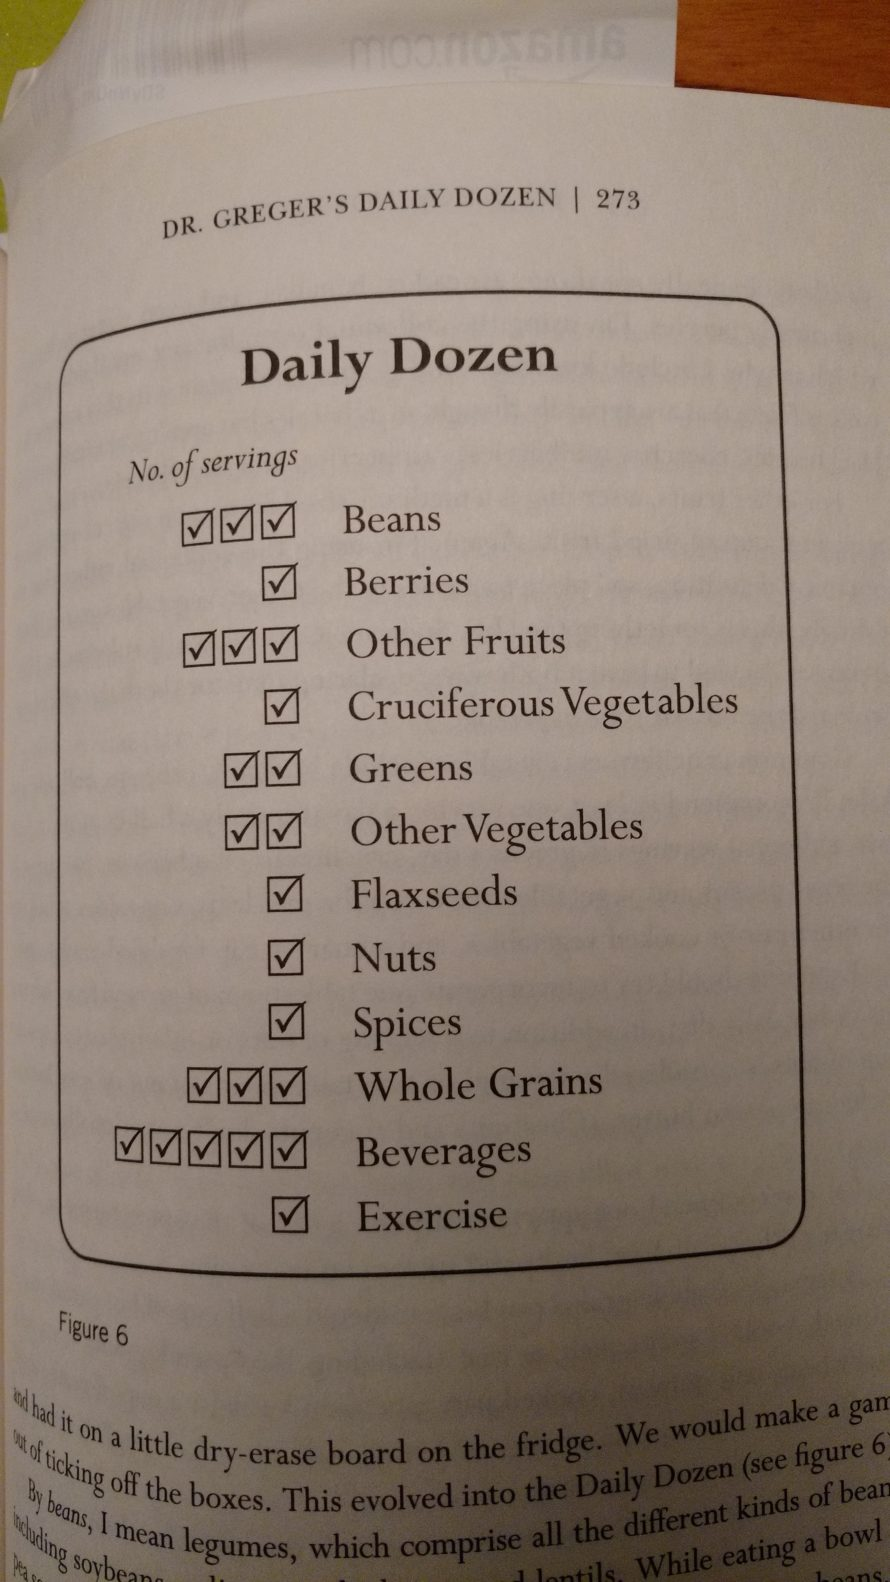 12 steps towards a healthier life.